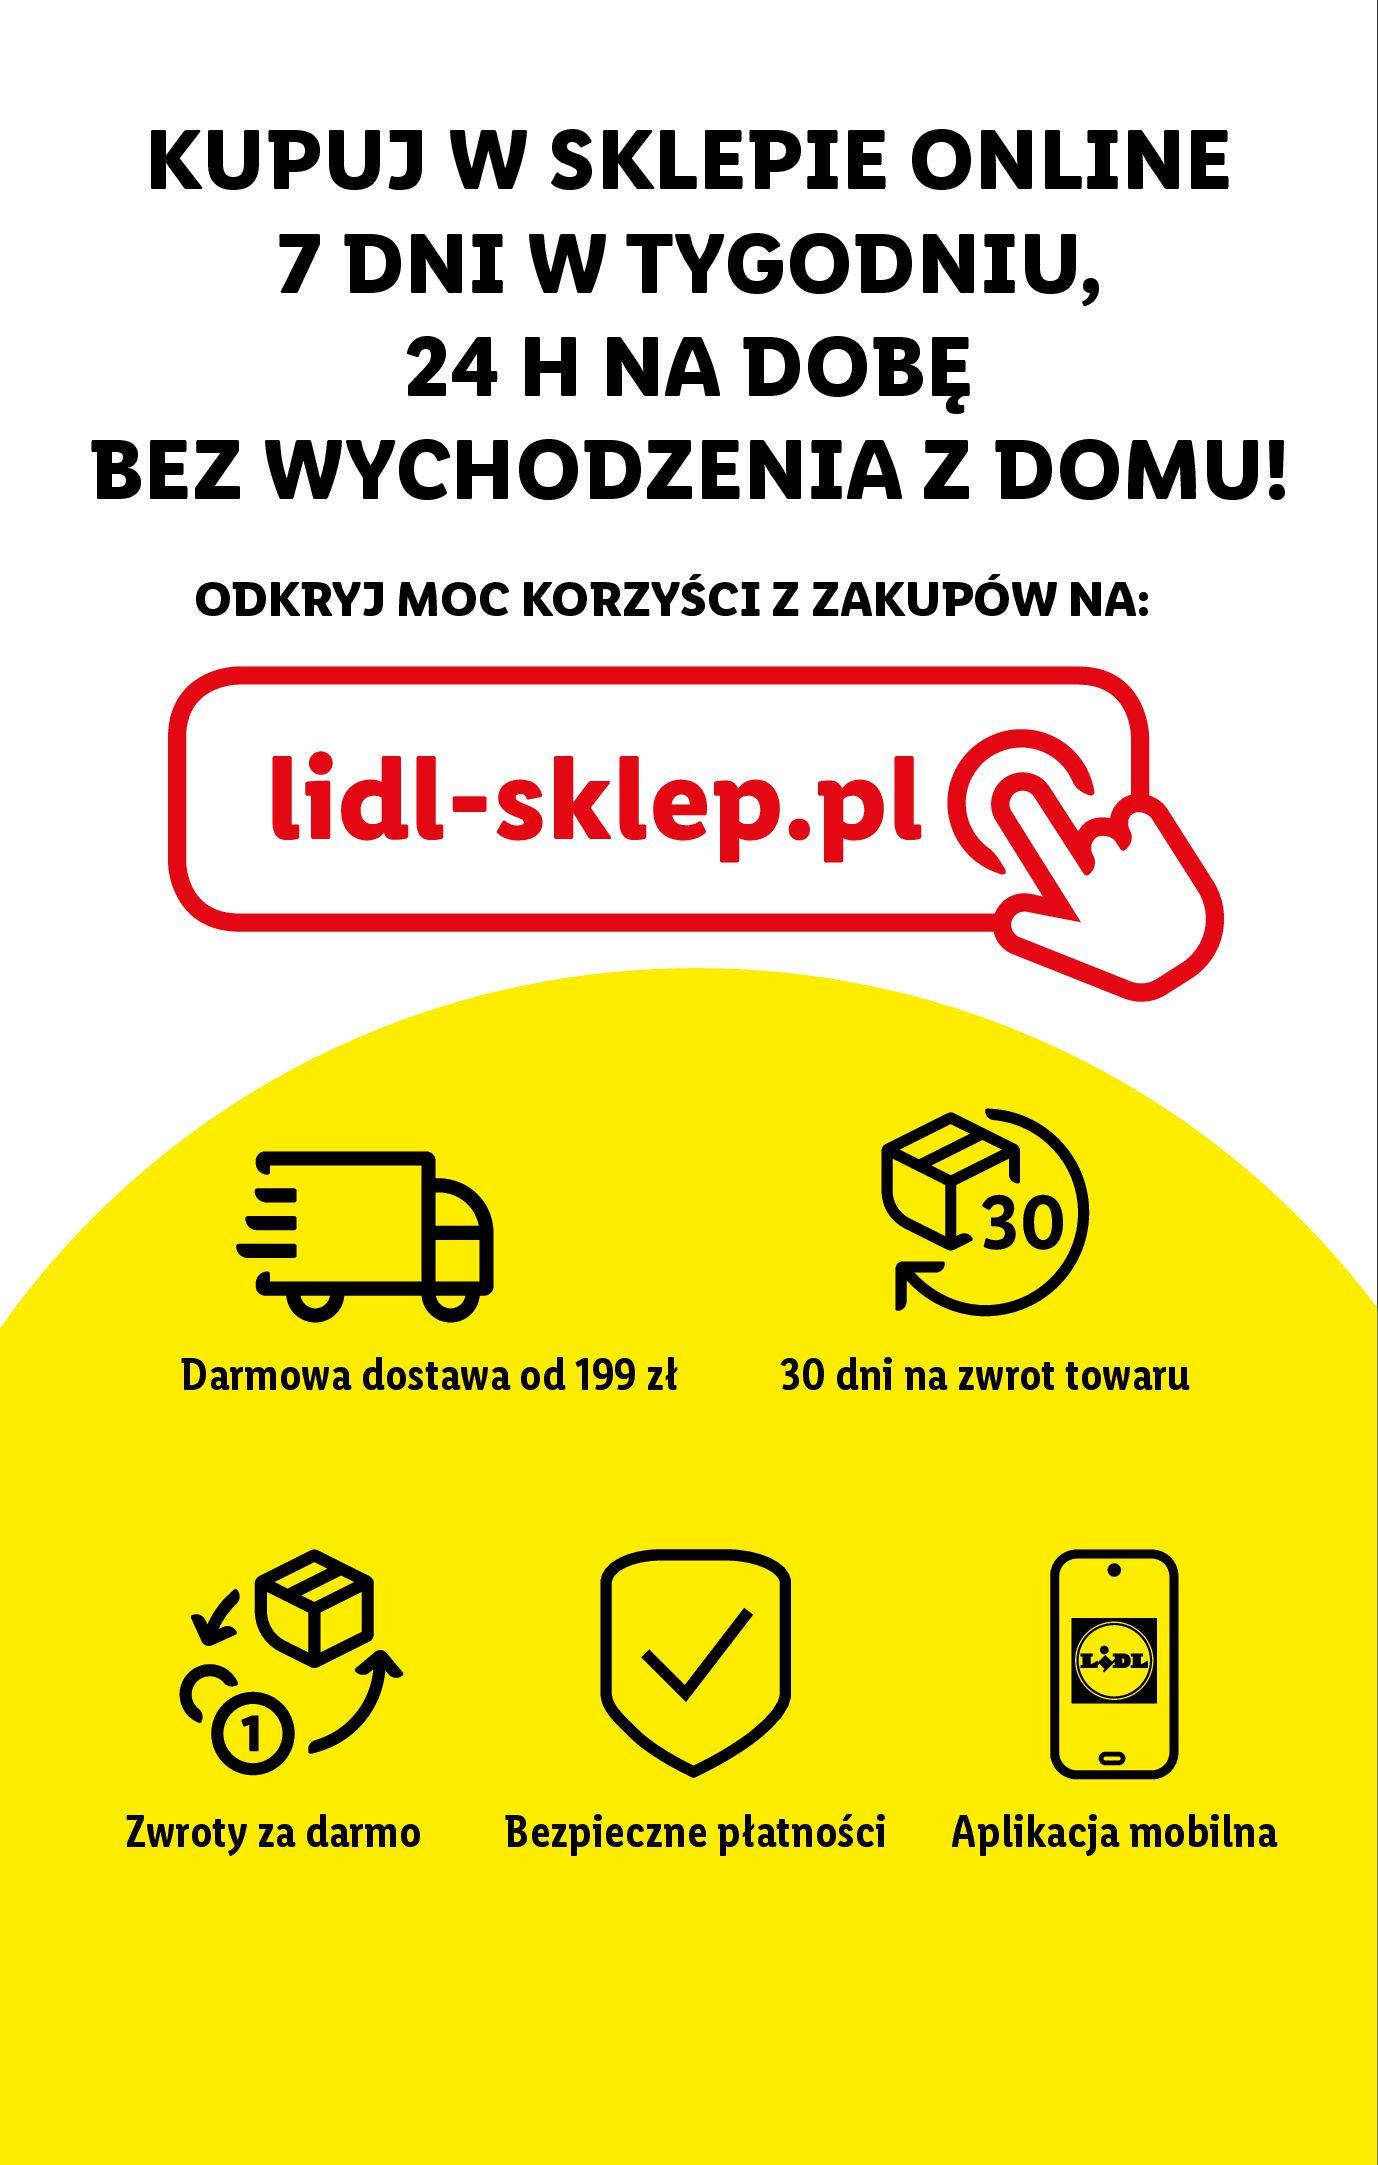 Gazetka Lidl: Katalog ONLINE - Rekreacja 2021-04-07 page-2